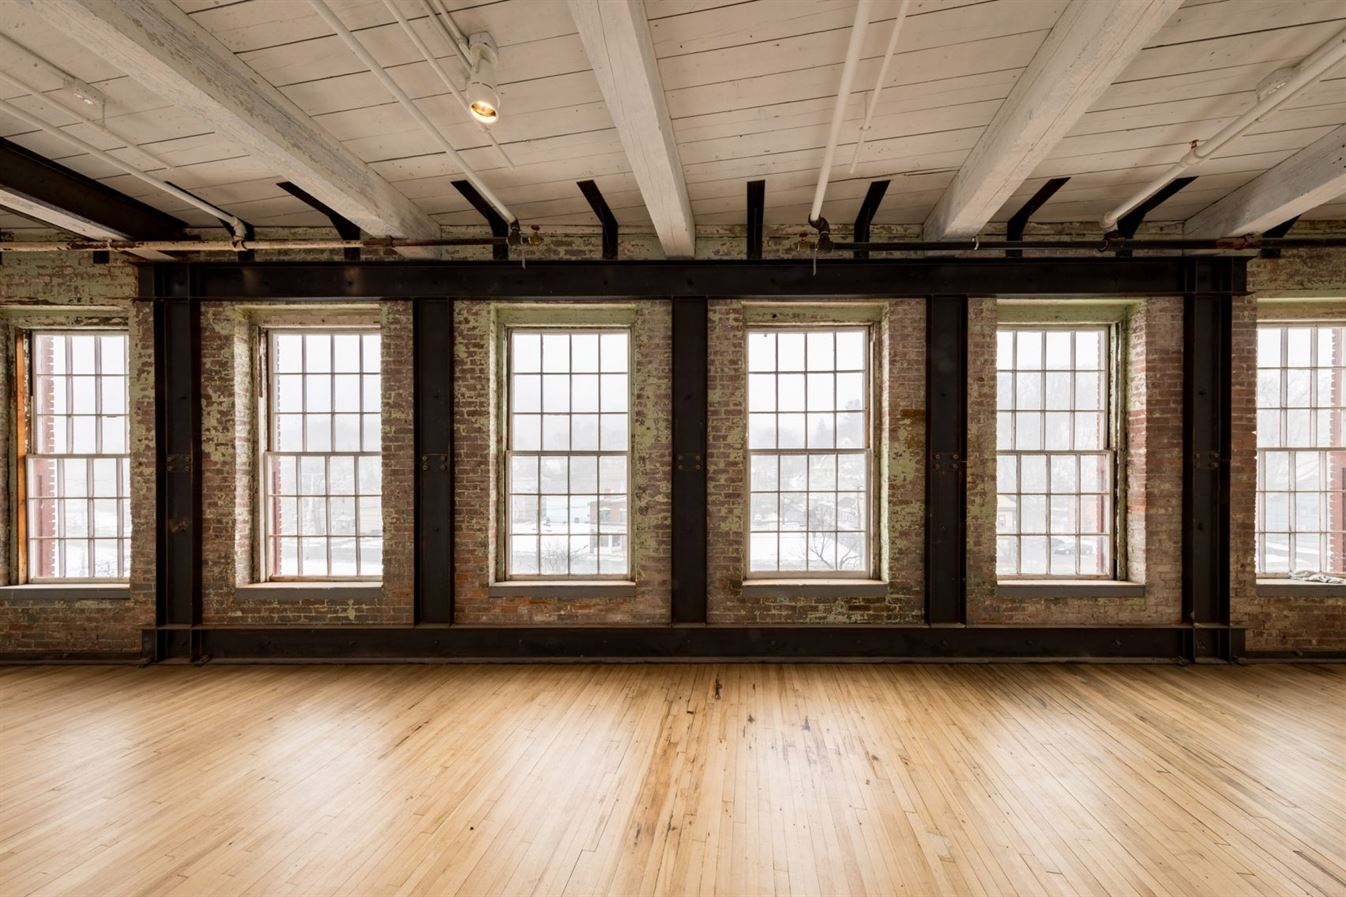 bruner-cott-mass-moca-massachusetts-museum-of-contemporary-art-museum-textile-factory-berkshires-expansio99999n-renovation_dezeen_5-1704